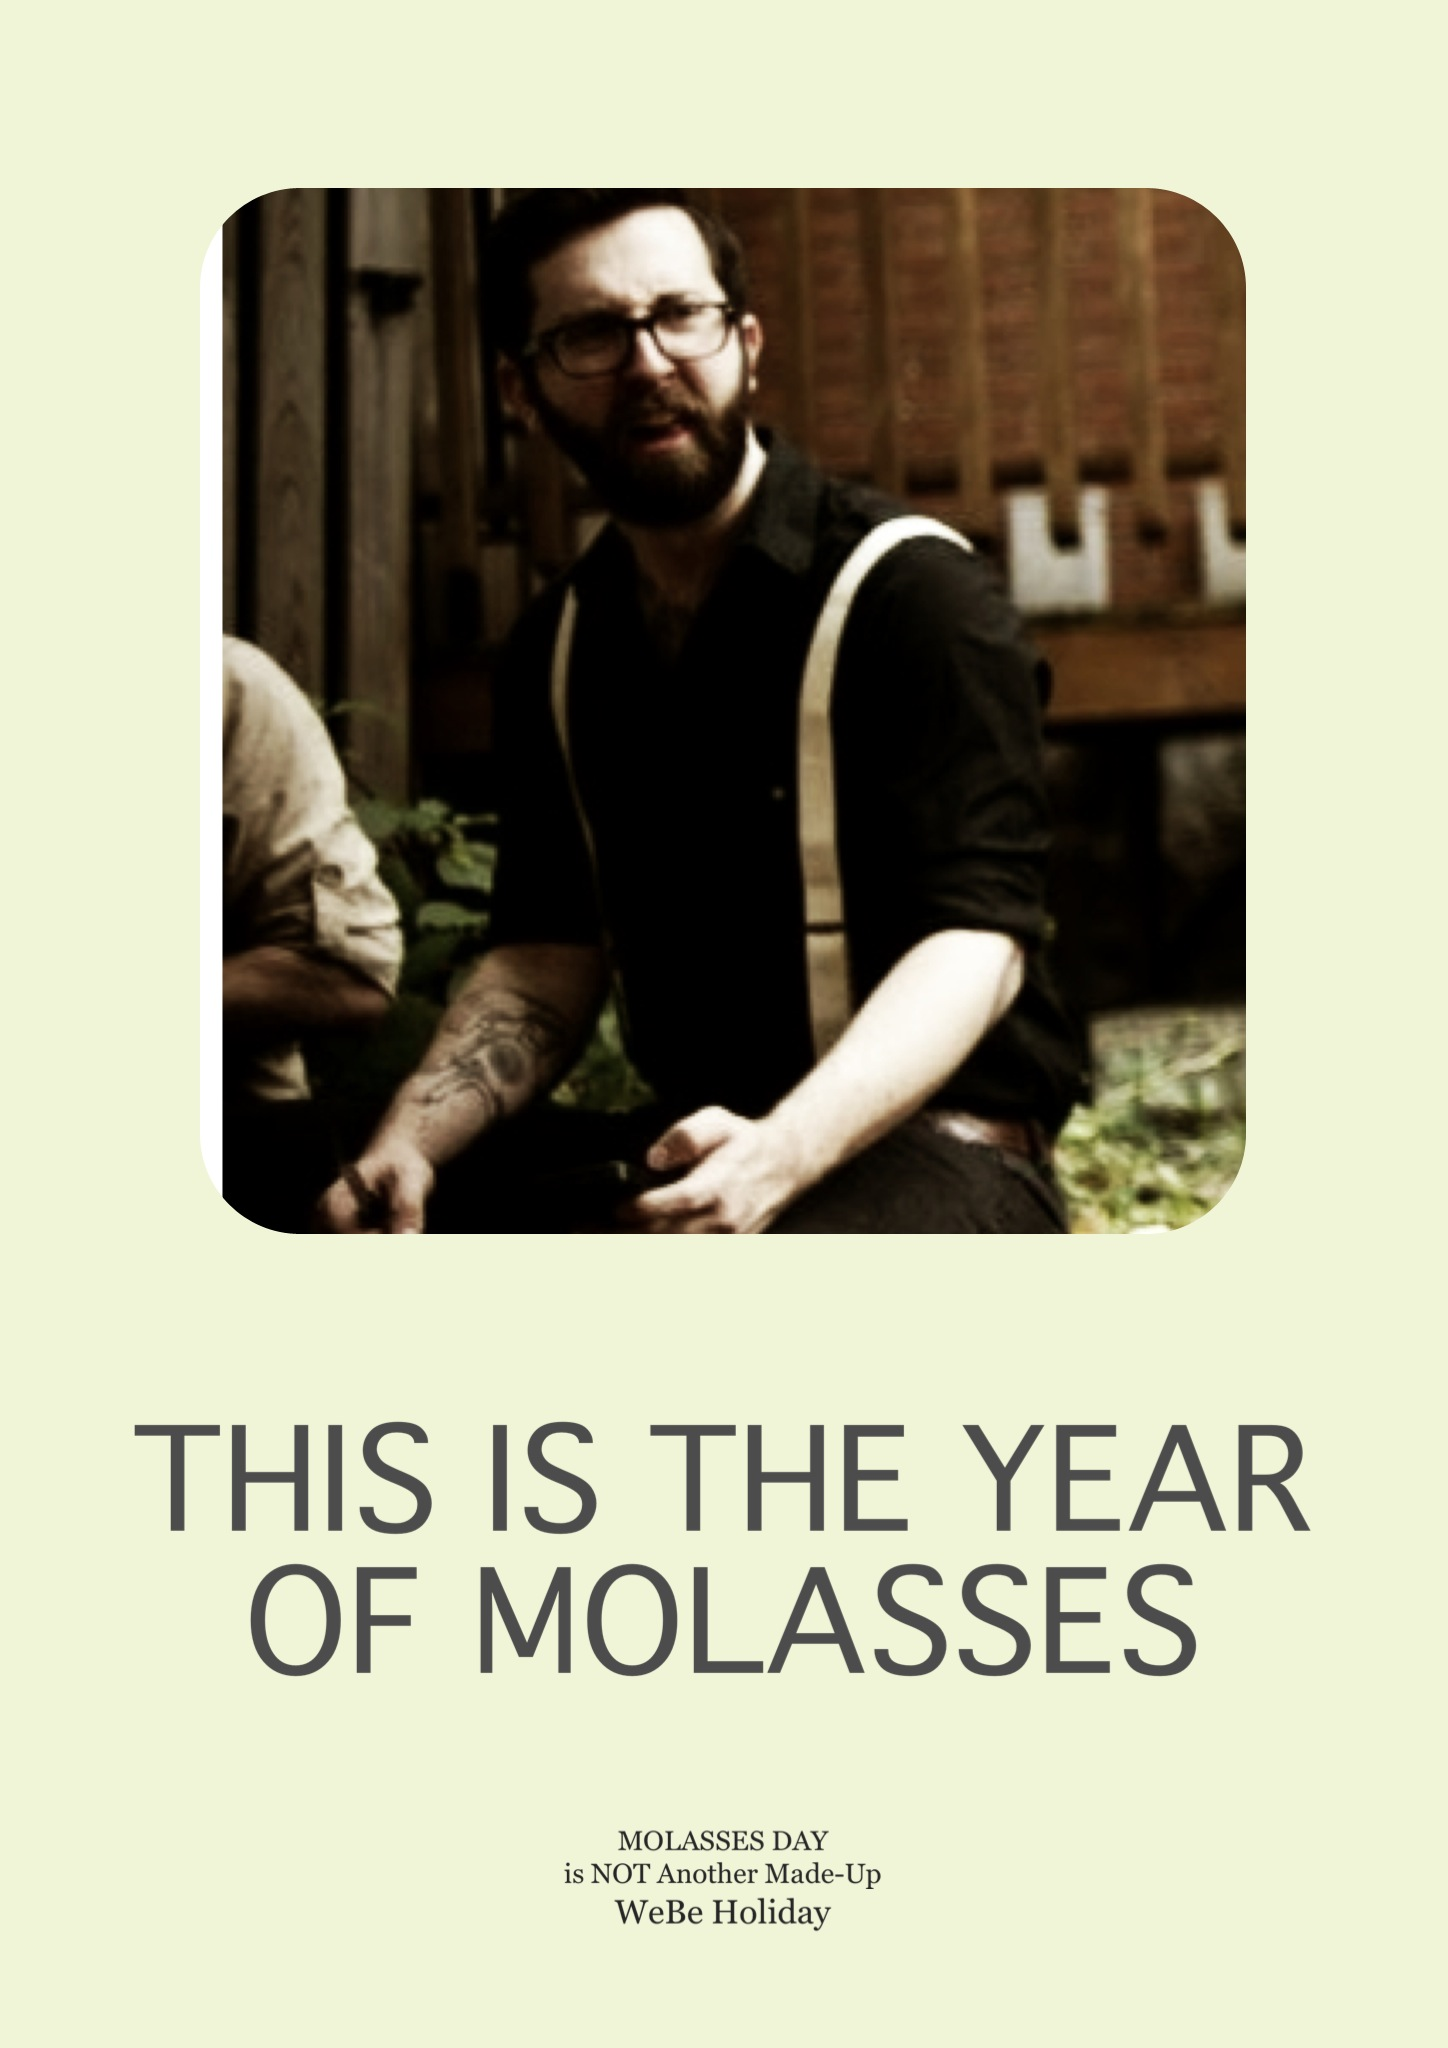 Molasses Day 2013 - Tristan 02.jpg